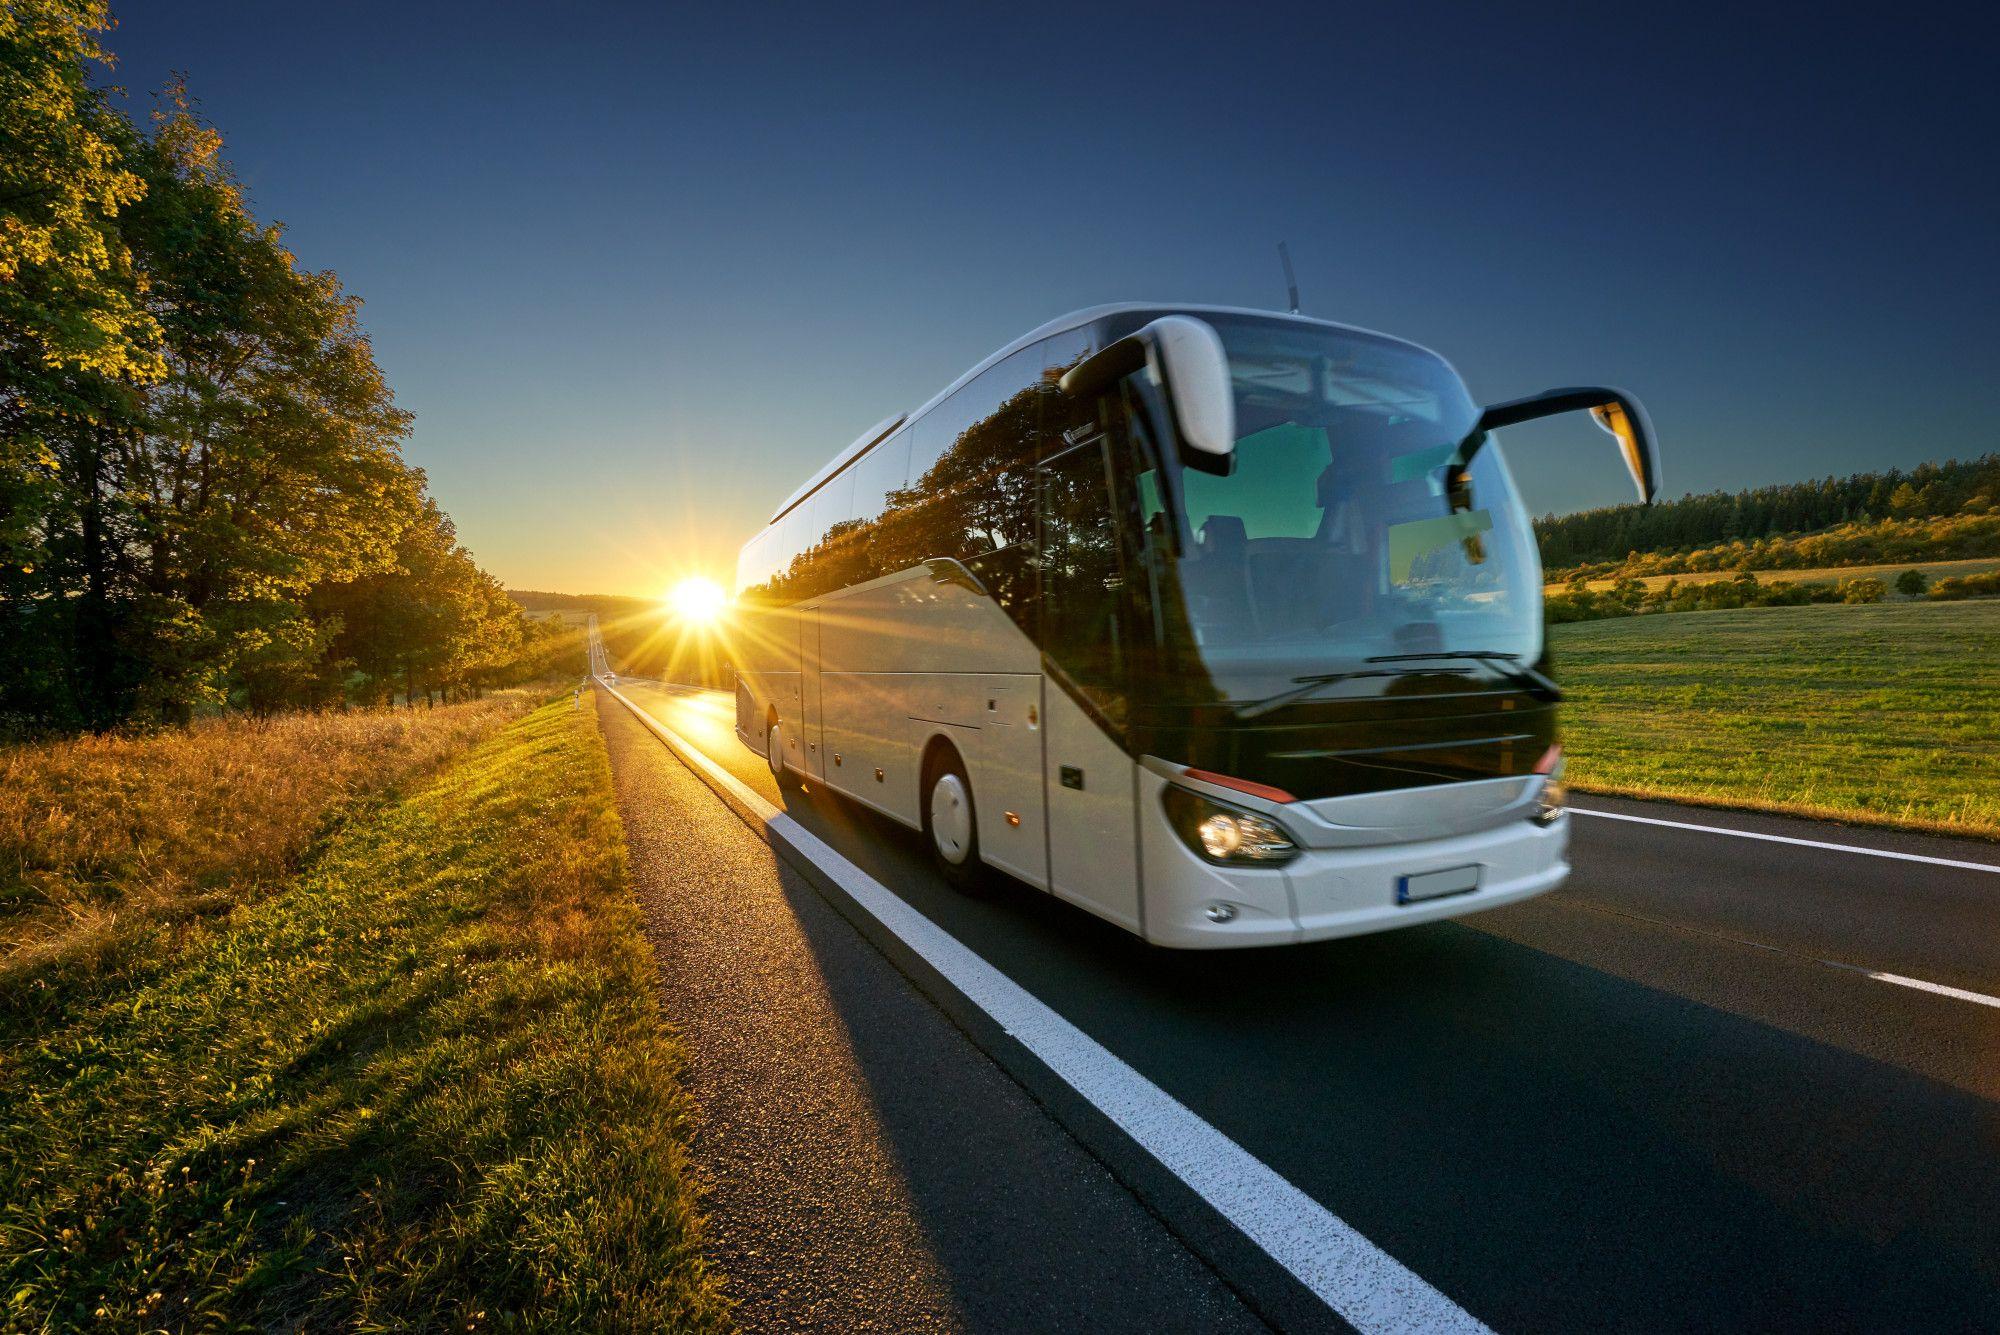 Autobus españa 3144